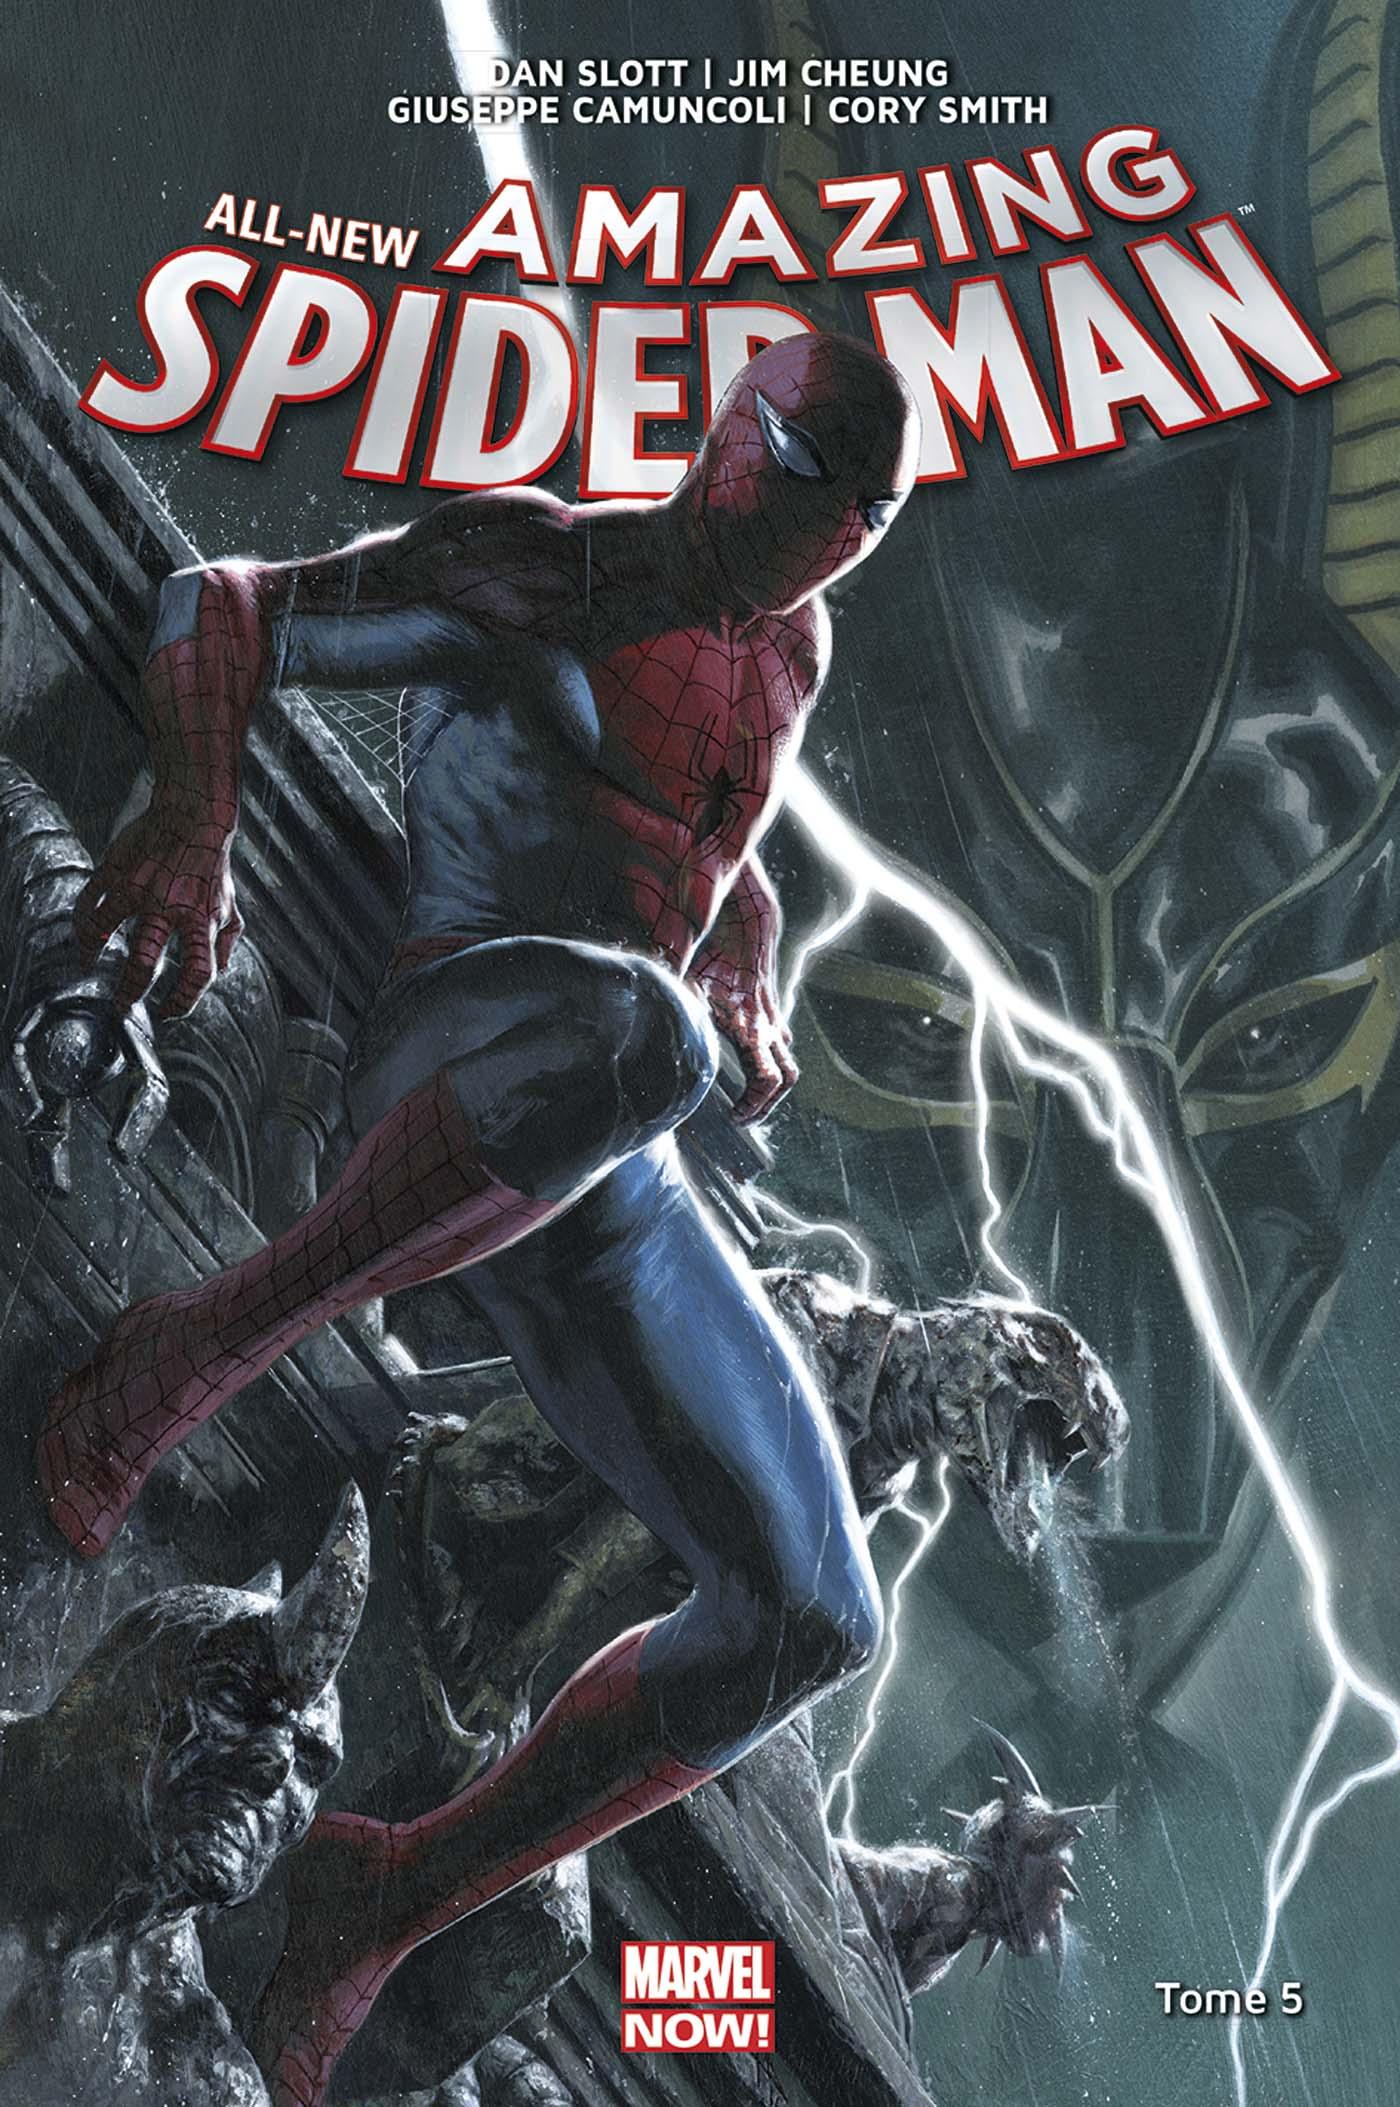 ALL-NEW AMAZING SPIDER-MAN T05 : LA CONSPIRATION DES CLONES